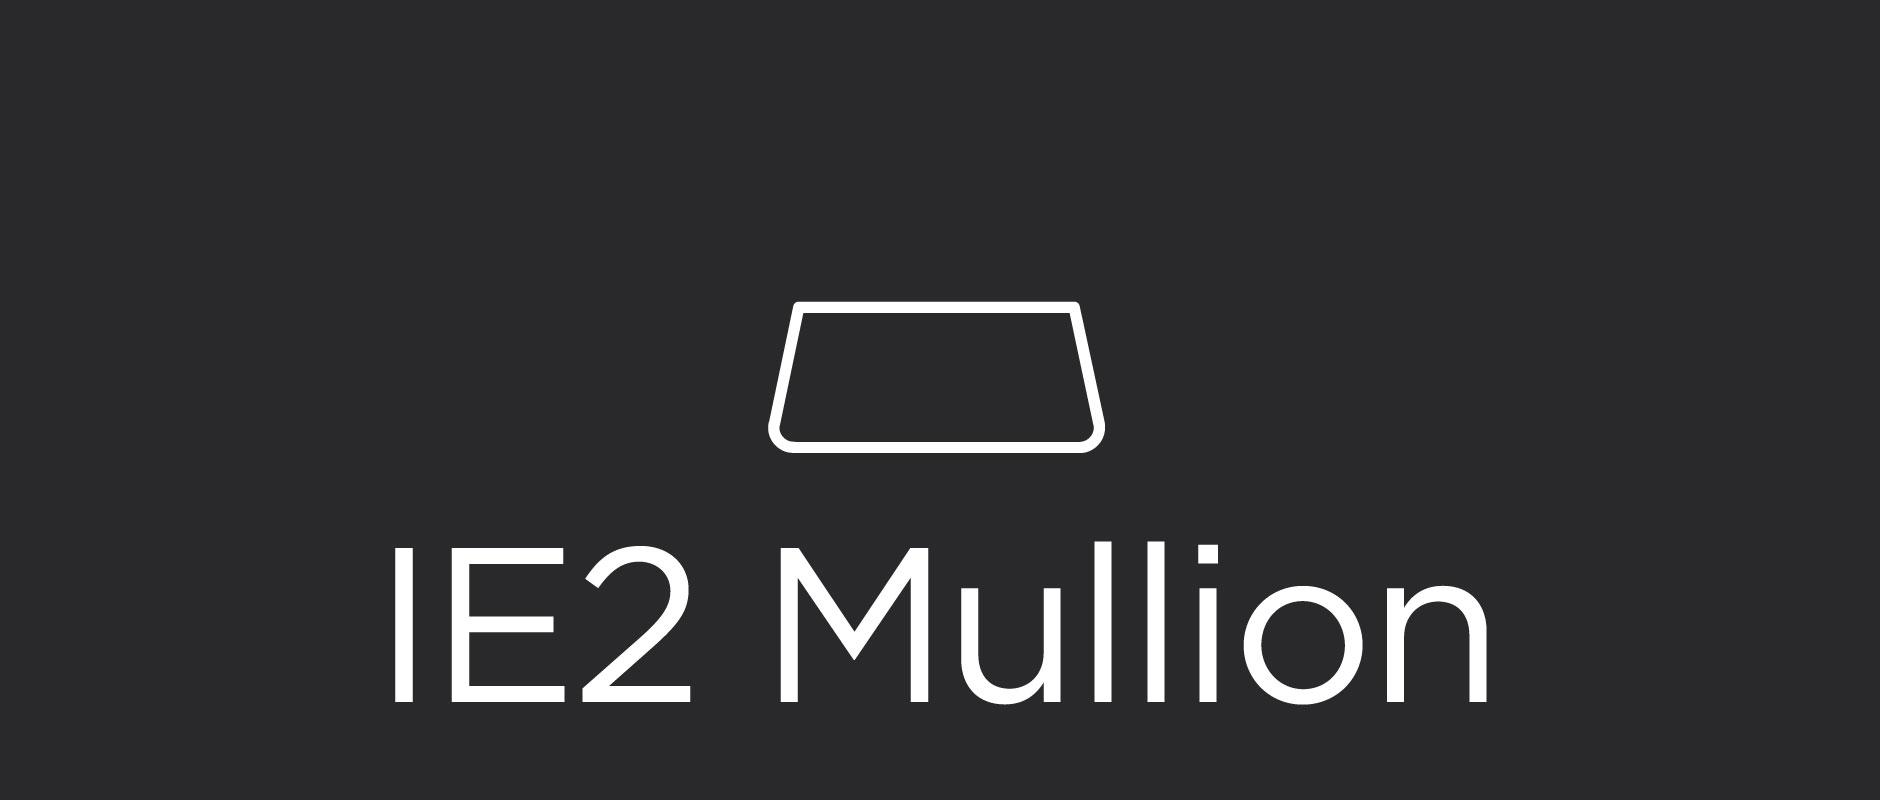 IE2 mullion for divided lite cabinet doors